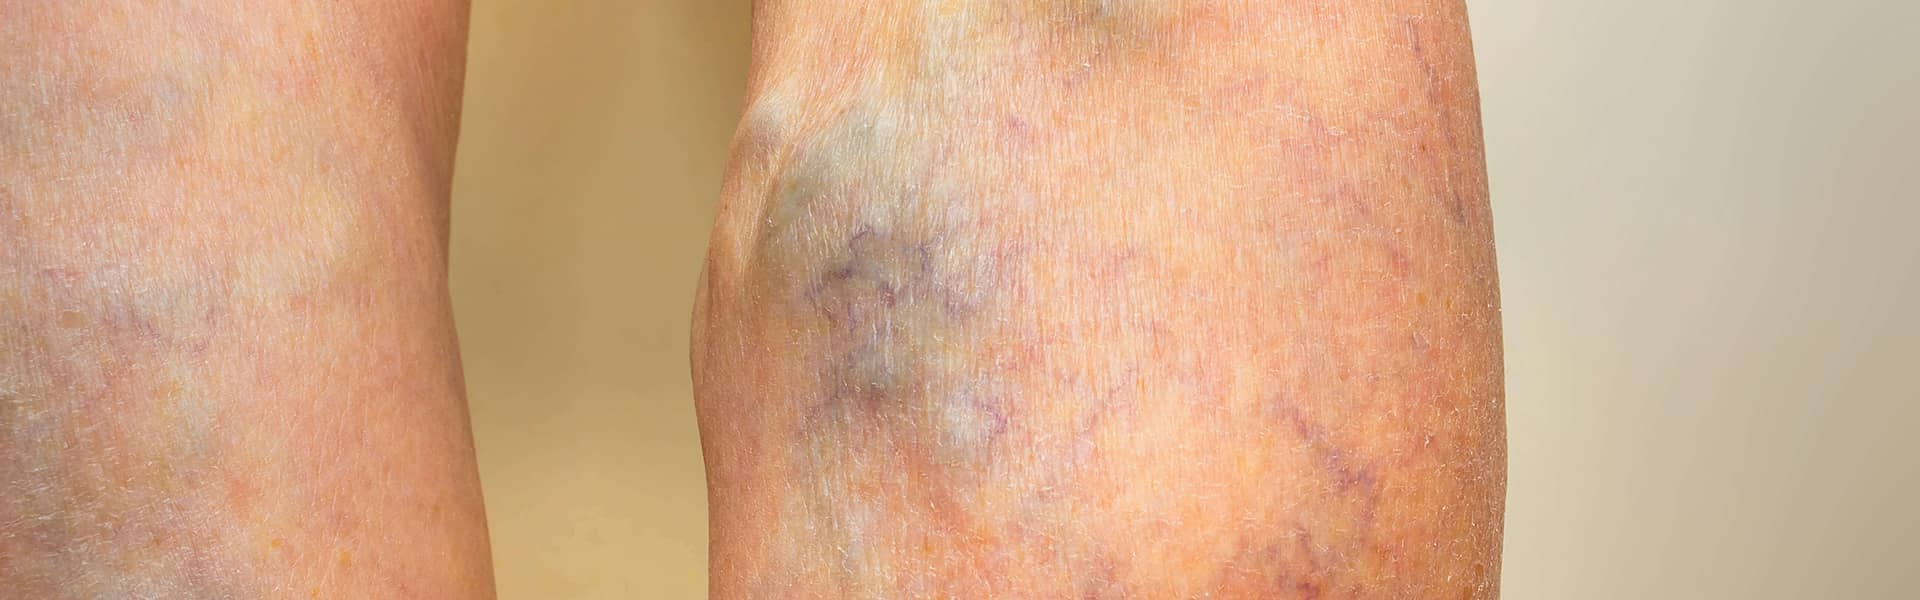 Varicose veins – Blog background photo – Vein Treatment Clinic in NY